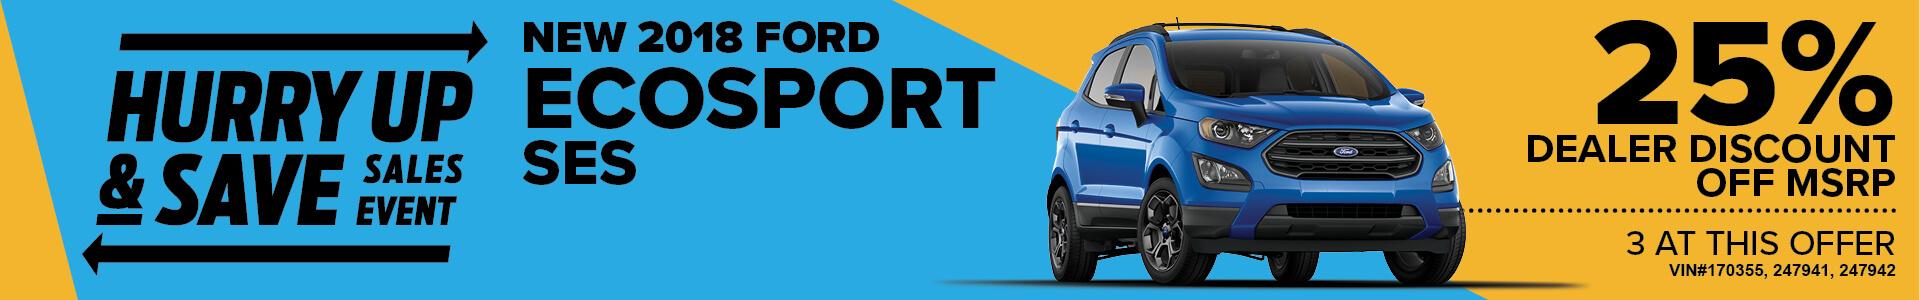 MJS Ad - 2018 EcoSport